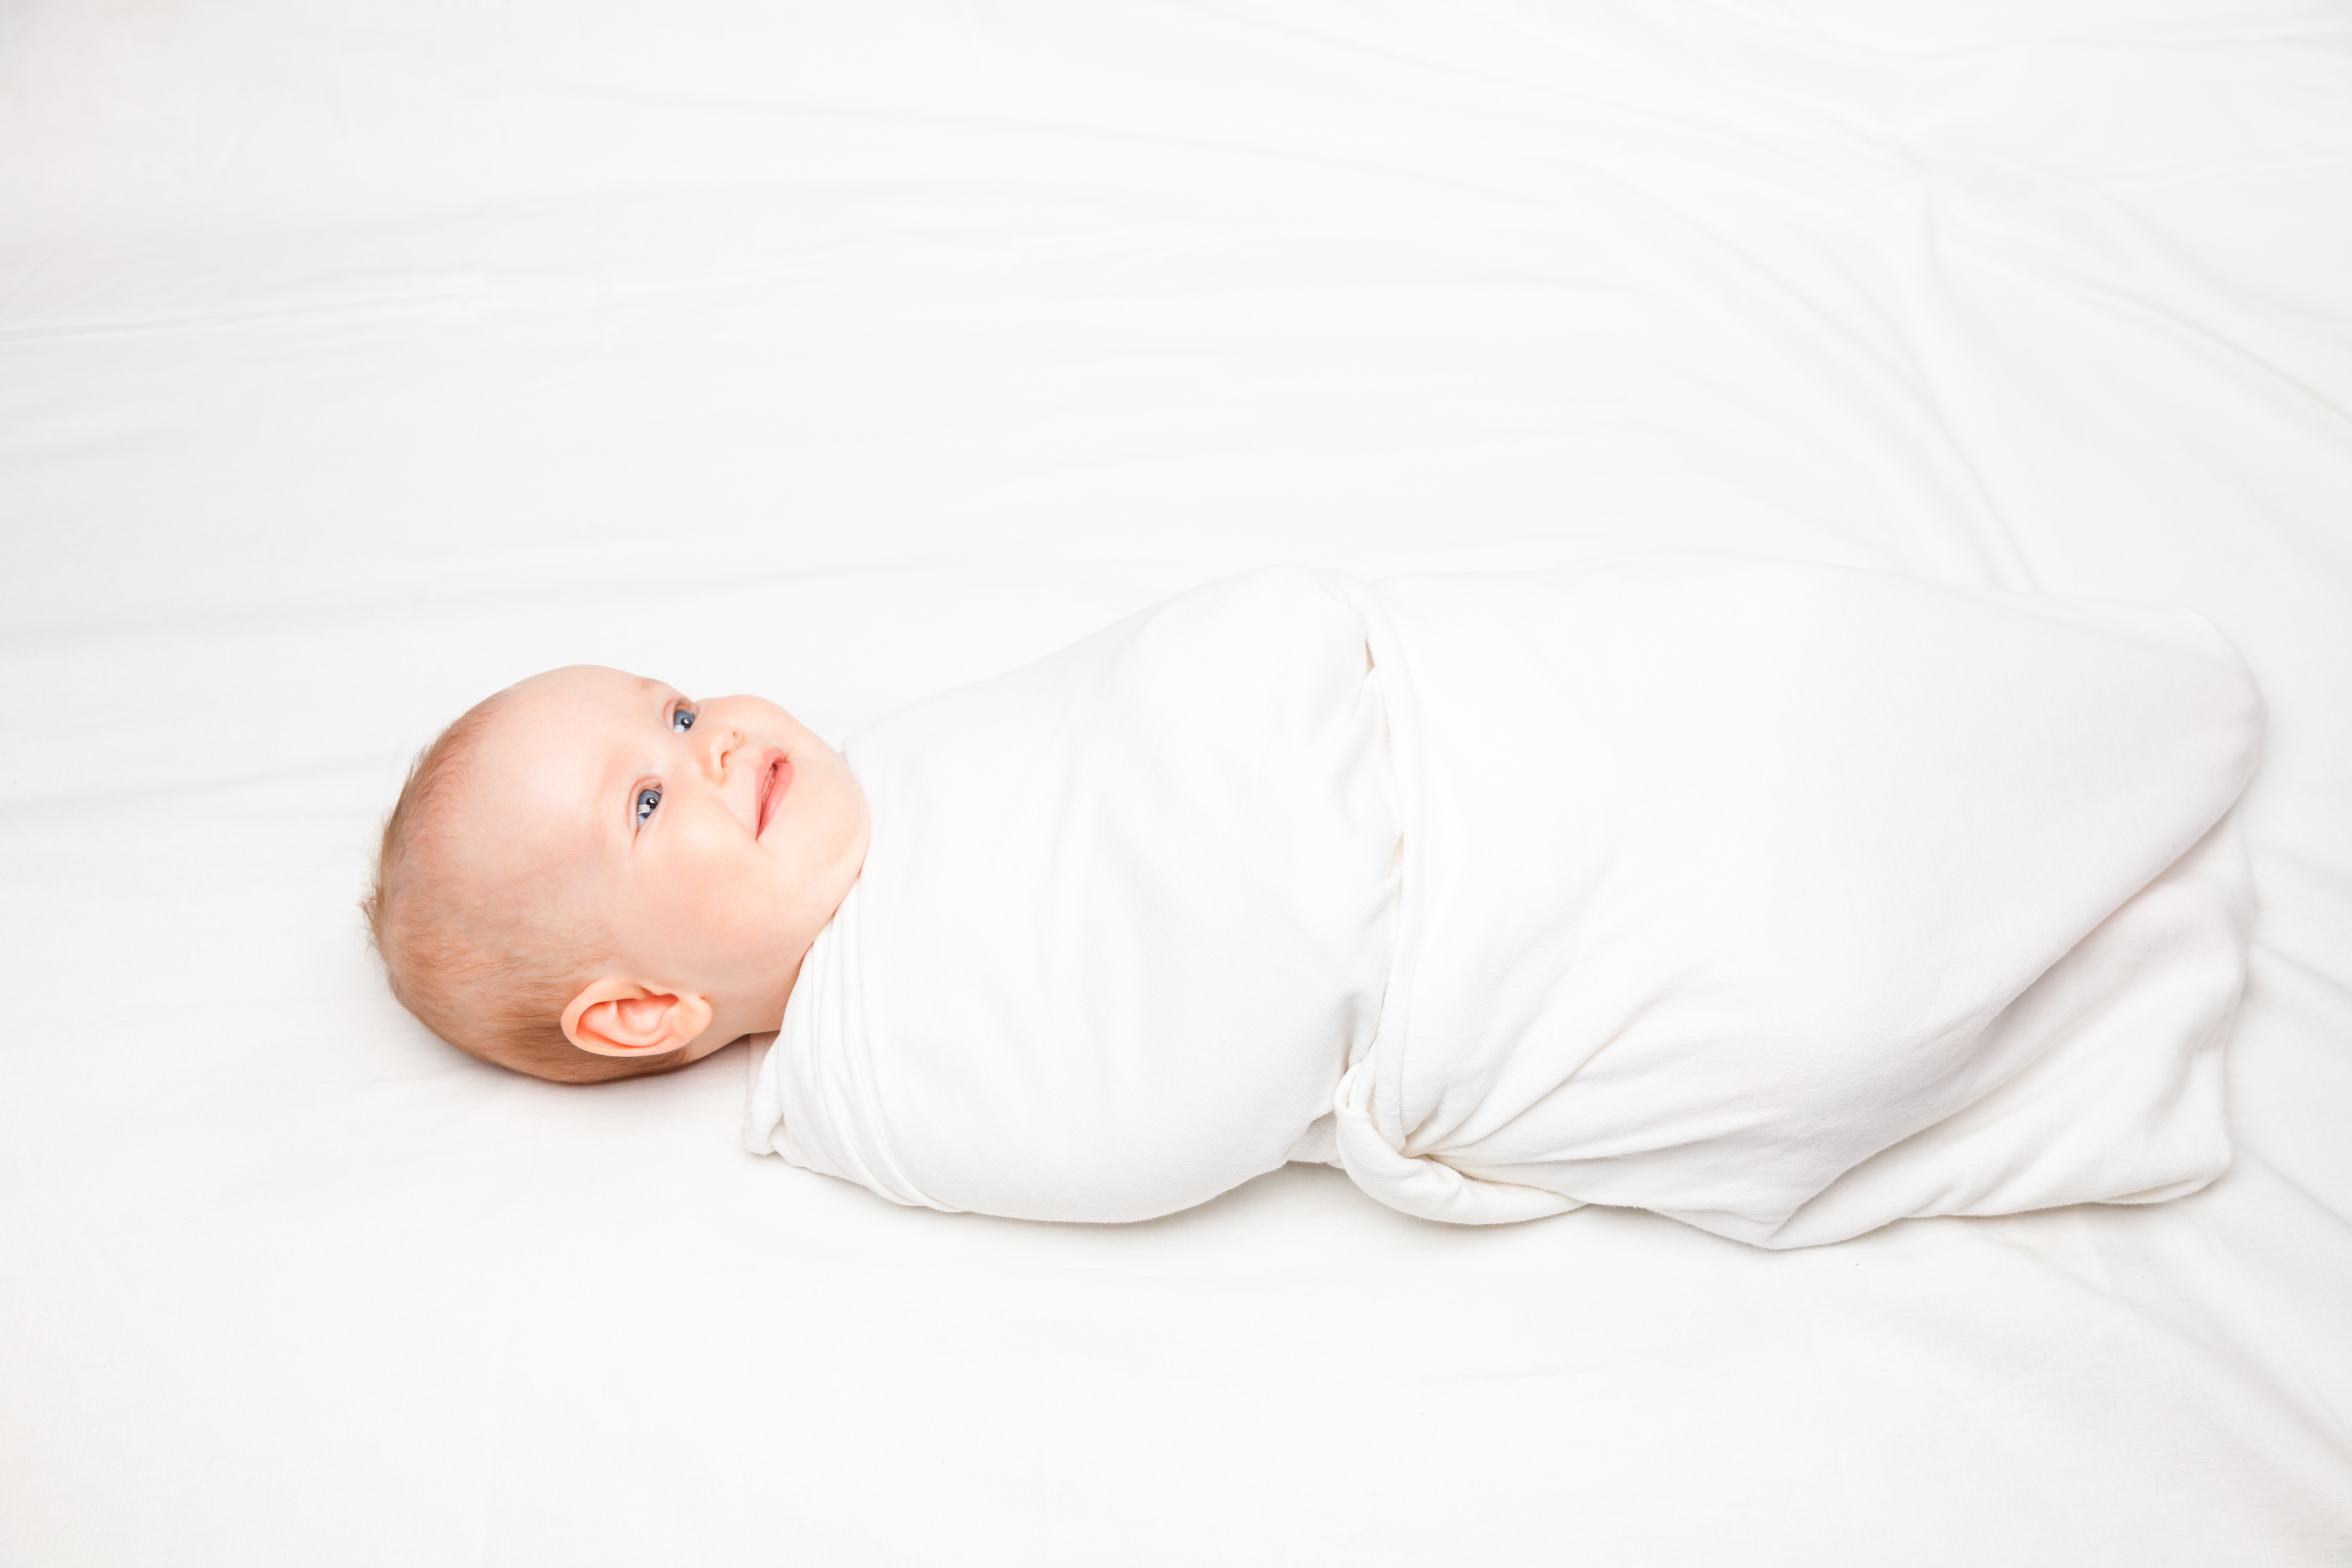 bigstock-Three-month-baby-girl-swaddled-103956806.jpg